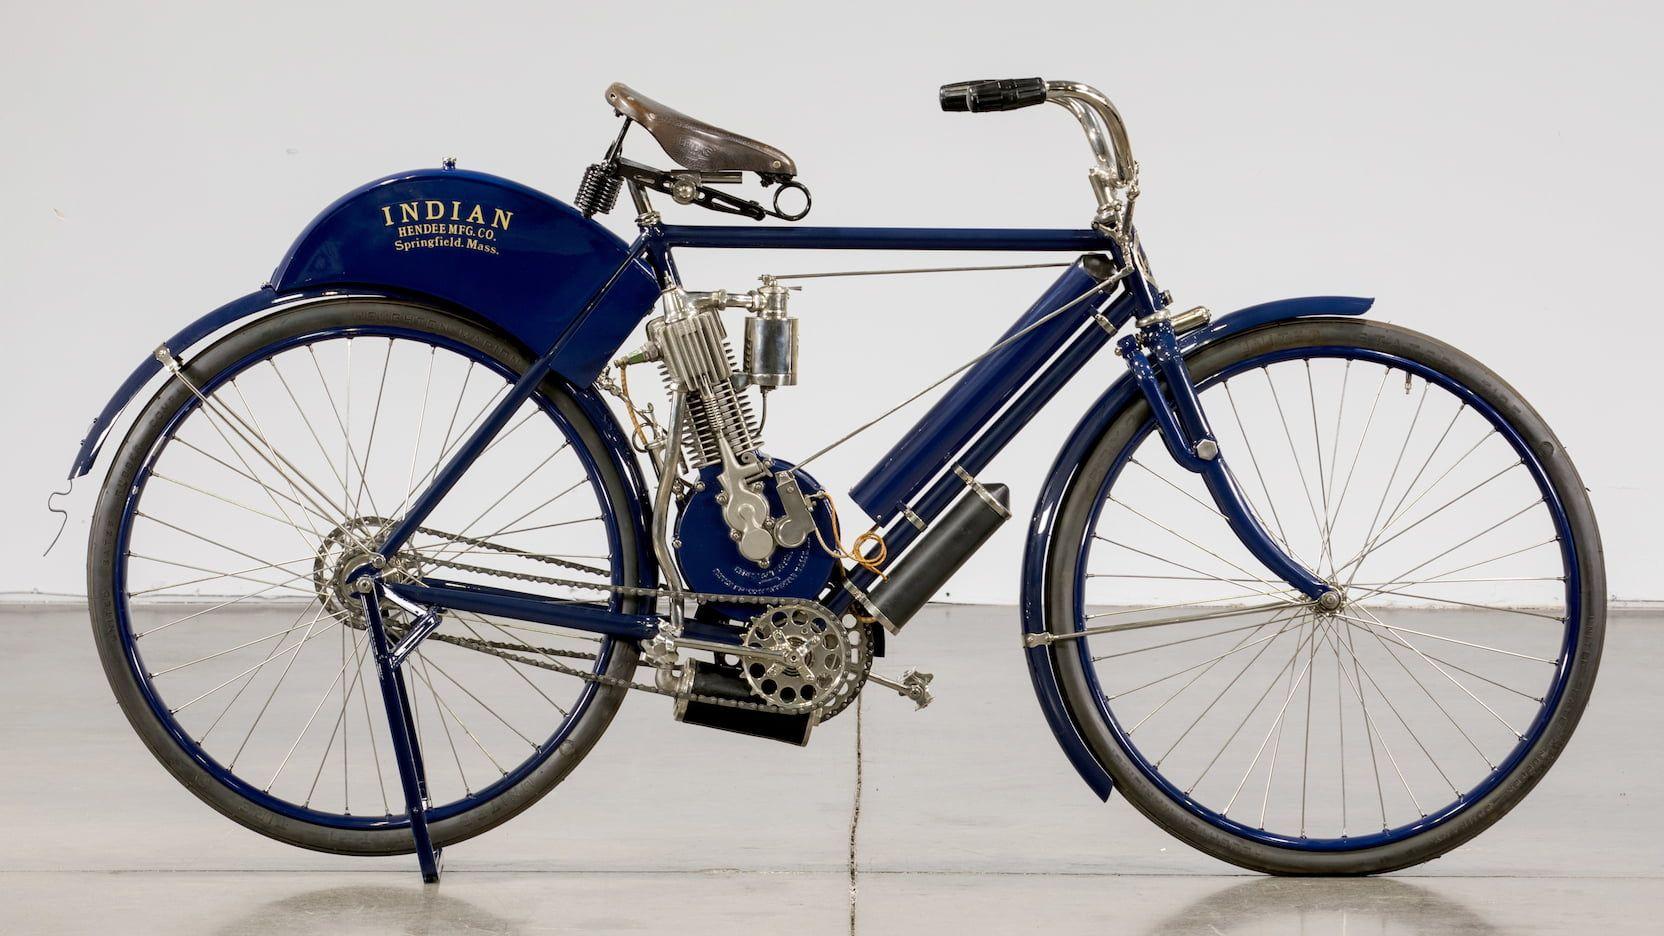 1905 Indian Camelback Presented As Lot F150 At Las Vegas Nv Mecum 2019 Mecum Retro Motorcycle Camelback